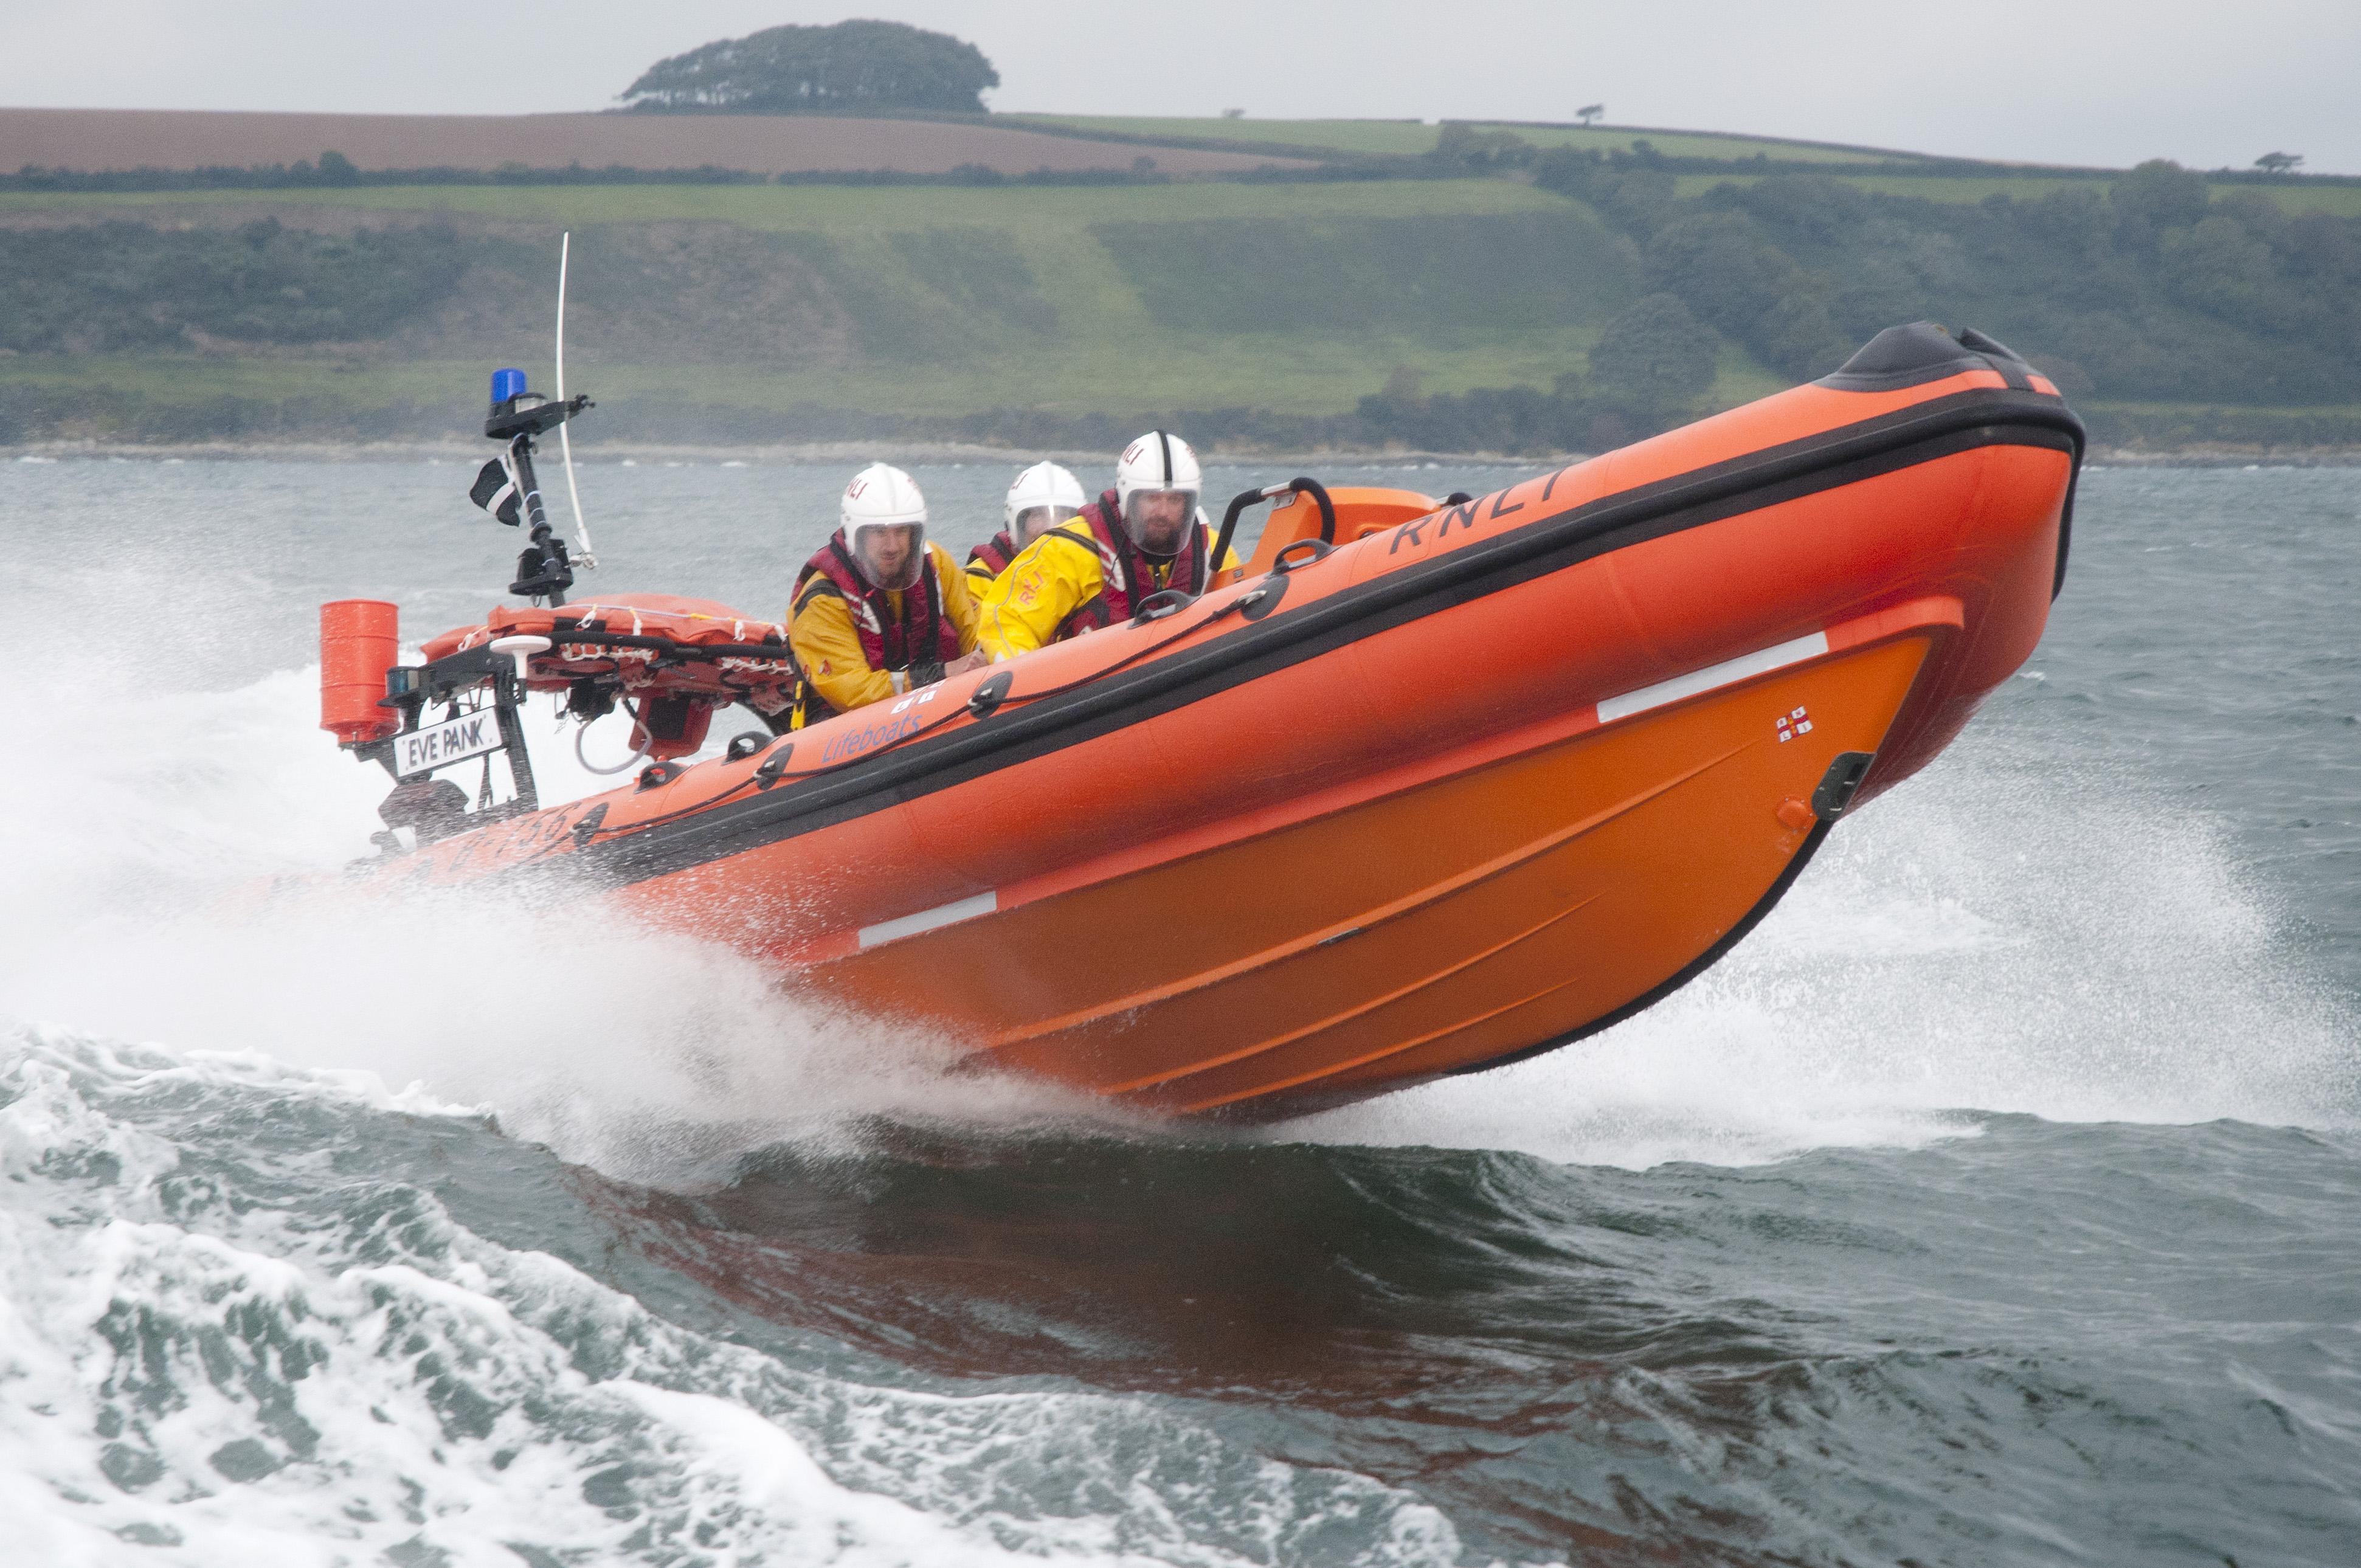 Life boat photo